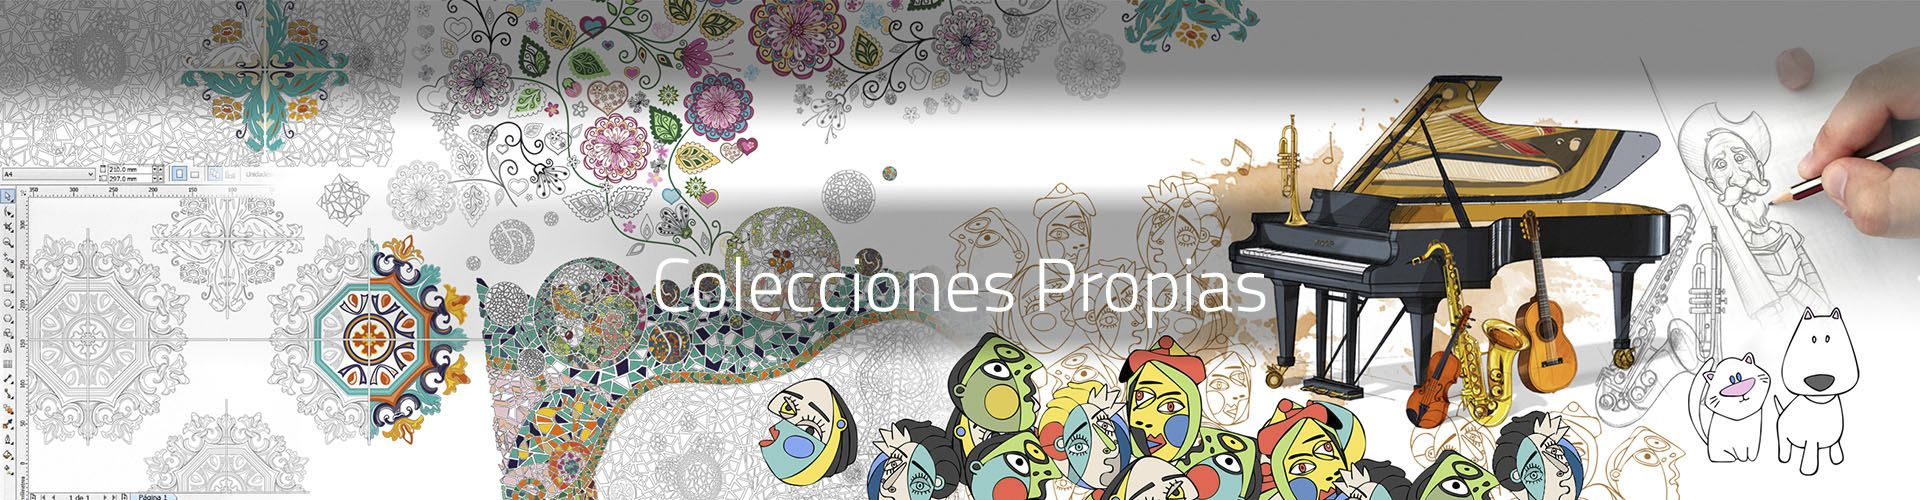 Cabecera Propias